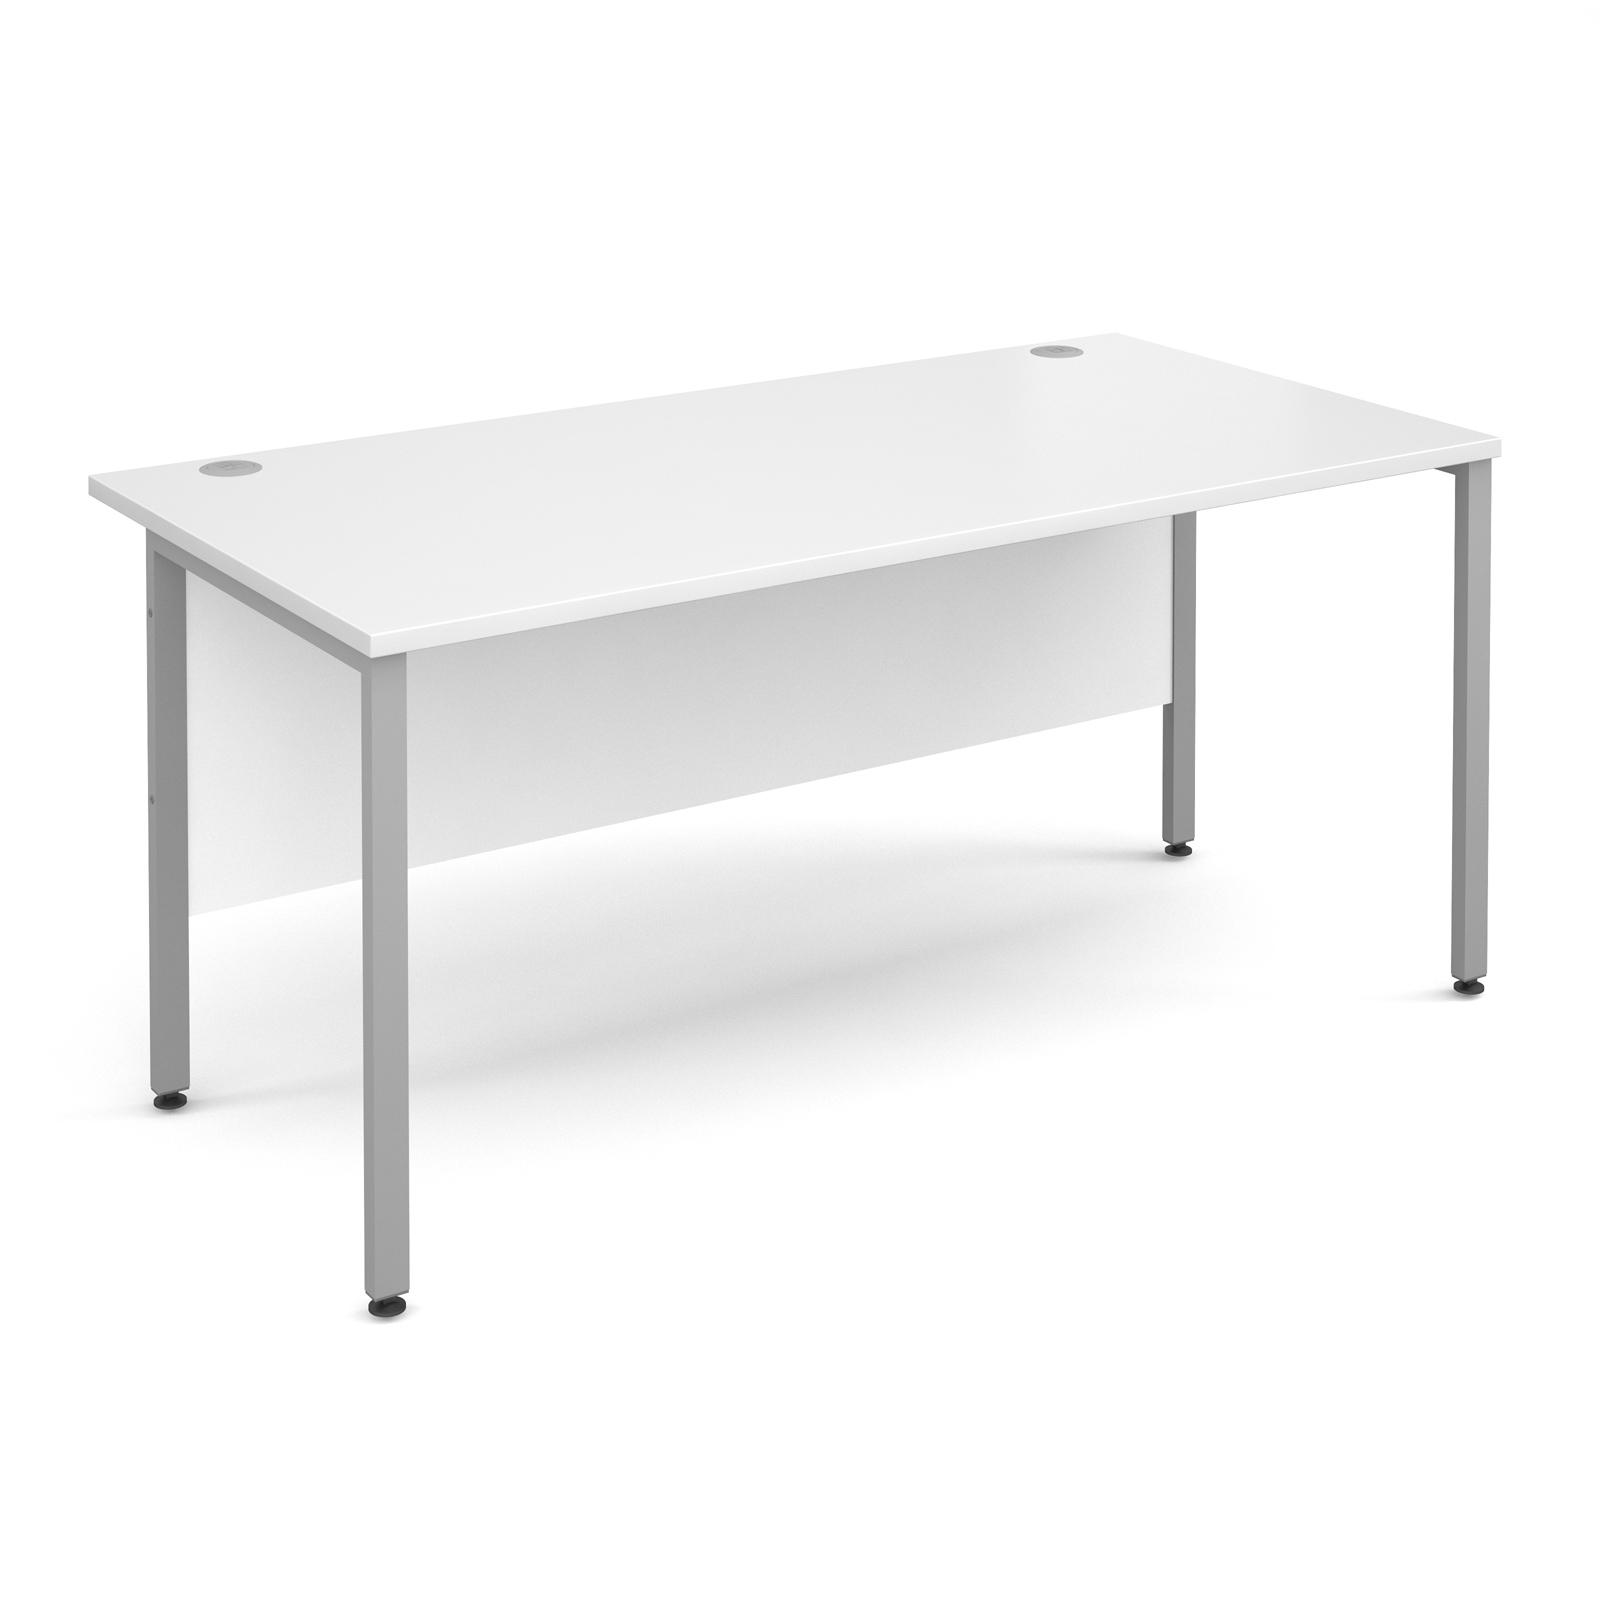 Maestro 25 SL Straight Desk 1600mm X 800mm